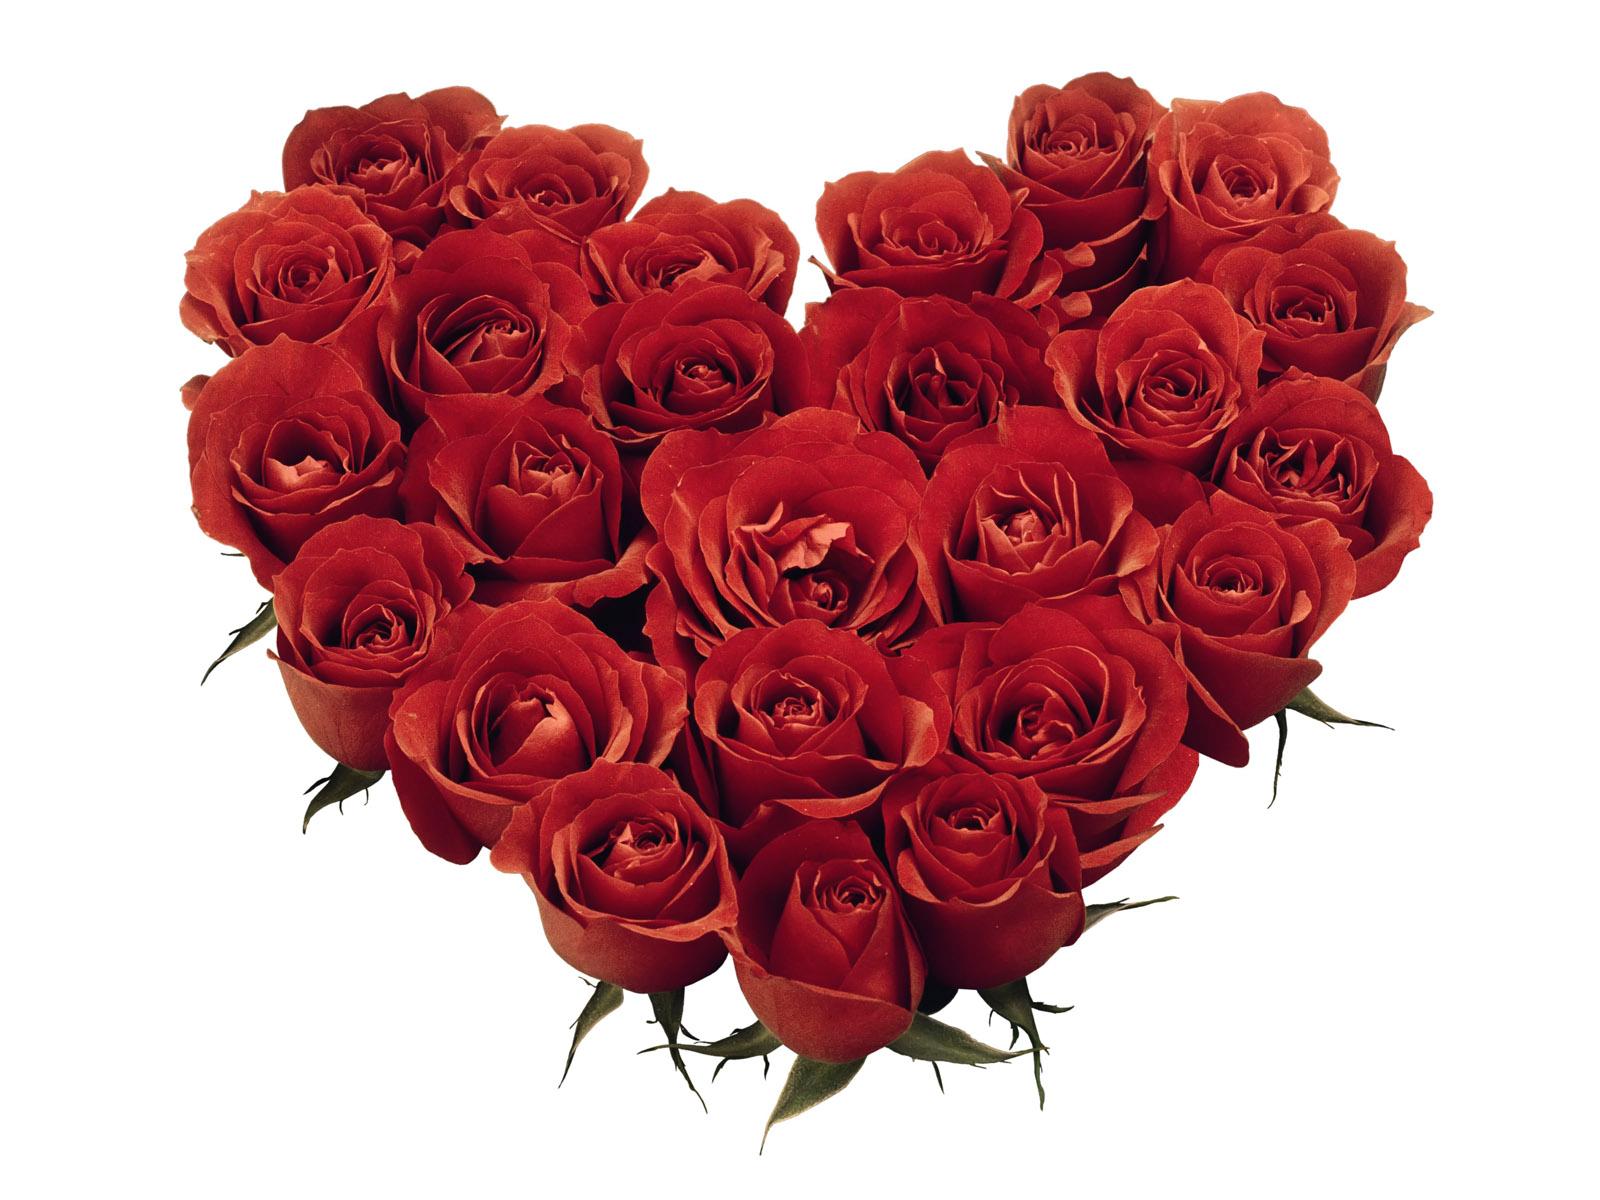 http://4.bp.blogspot.com/-gbYyFsHClB8/TVnUMhA6o6I/AAAAAAAAA70/_VIHSEVHdQ4/s1600/Red-roses-heart_wallpapers_8197_1600x1200.jpg